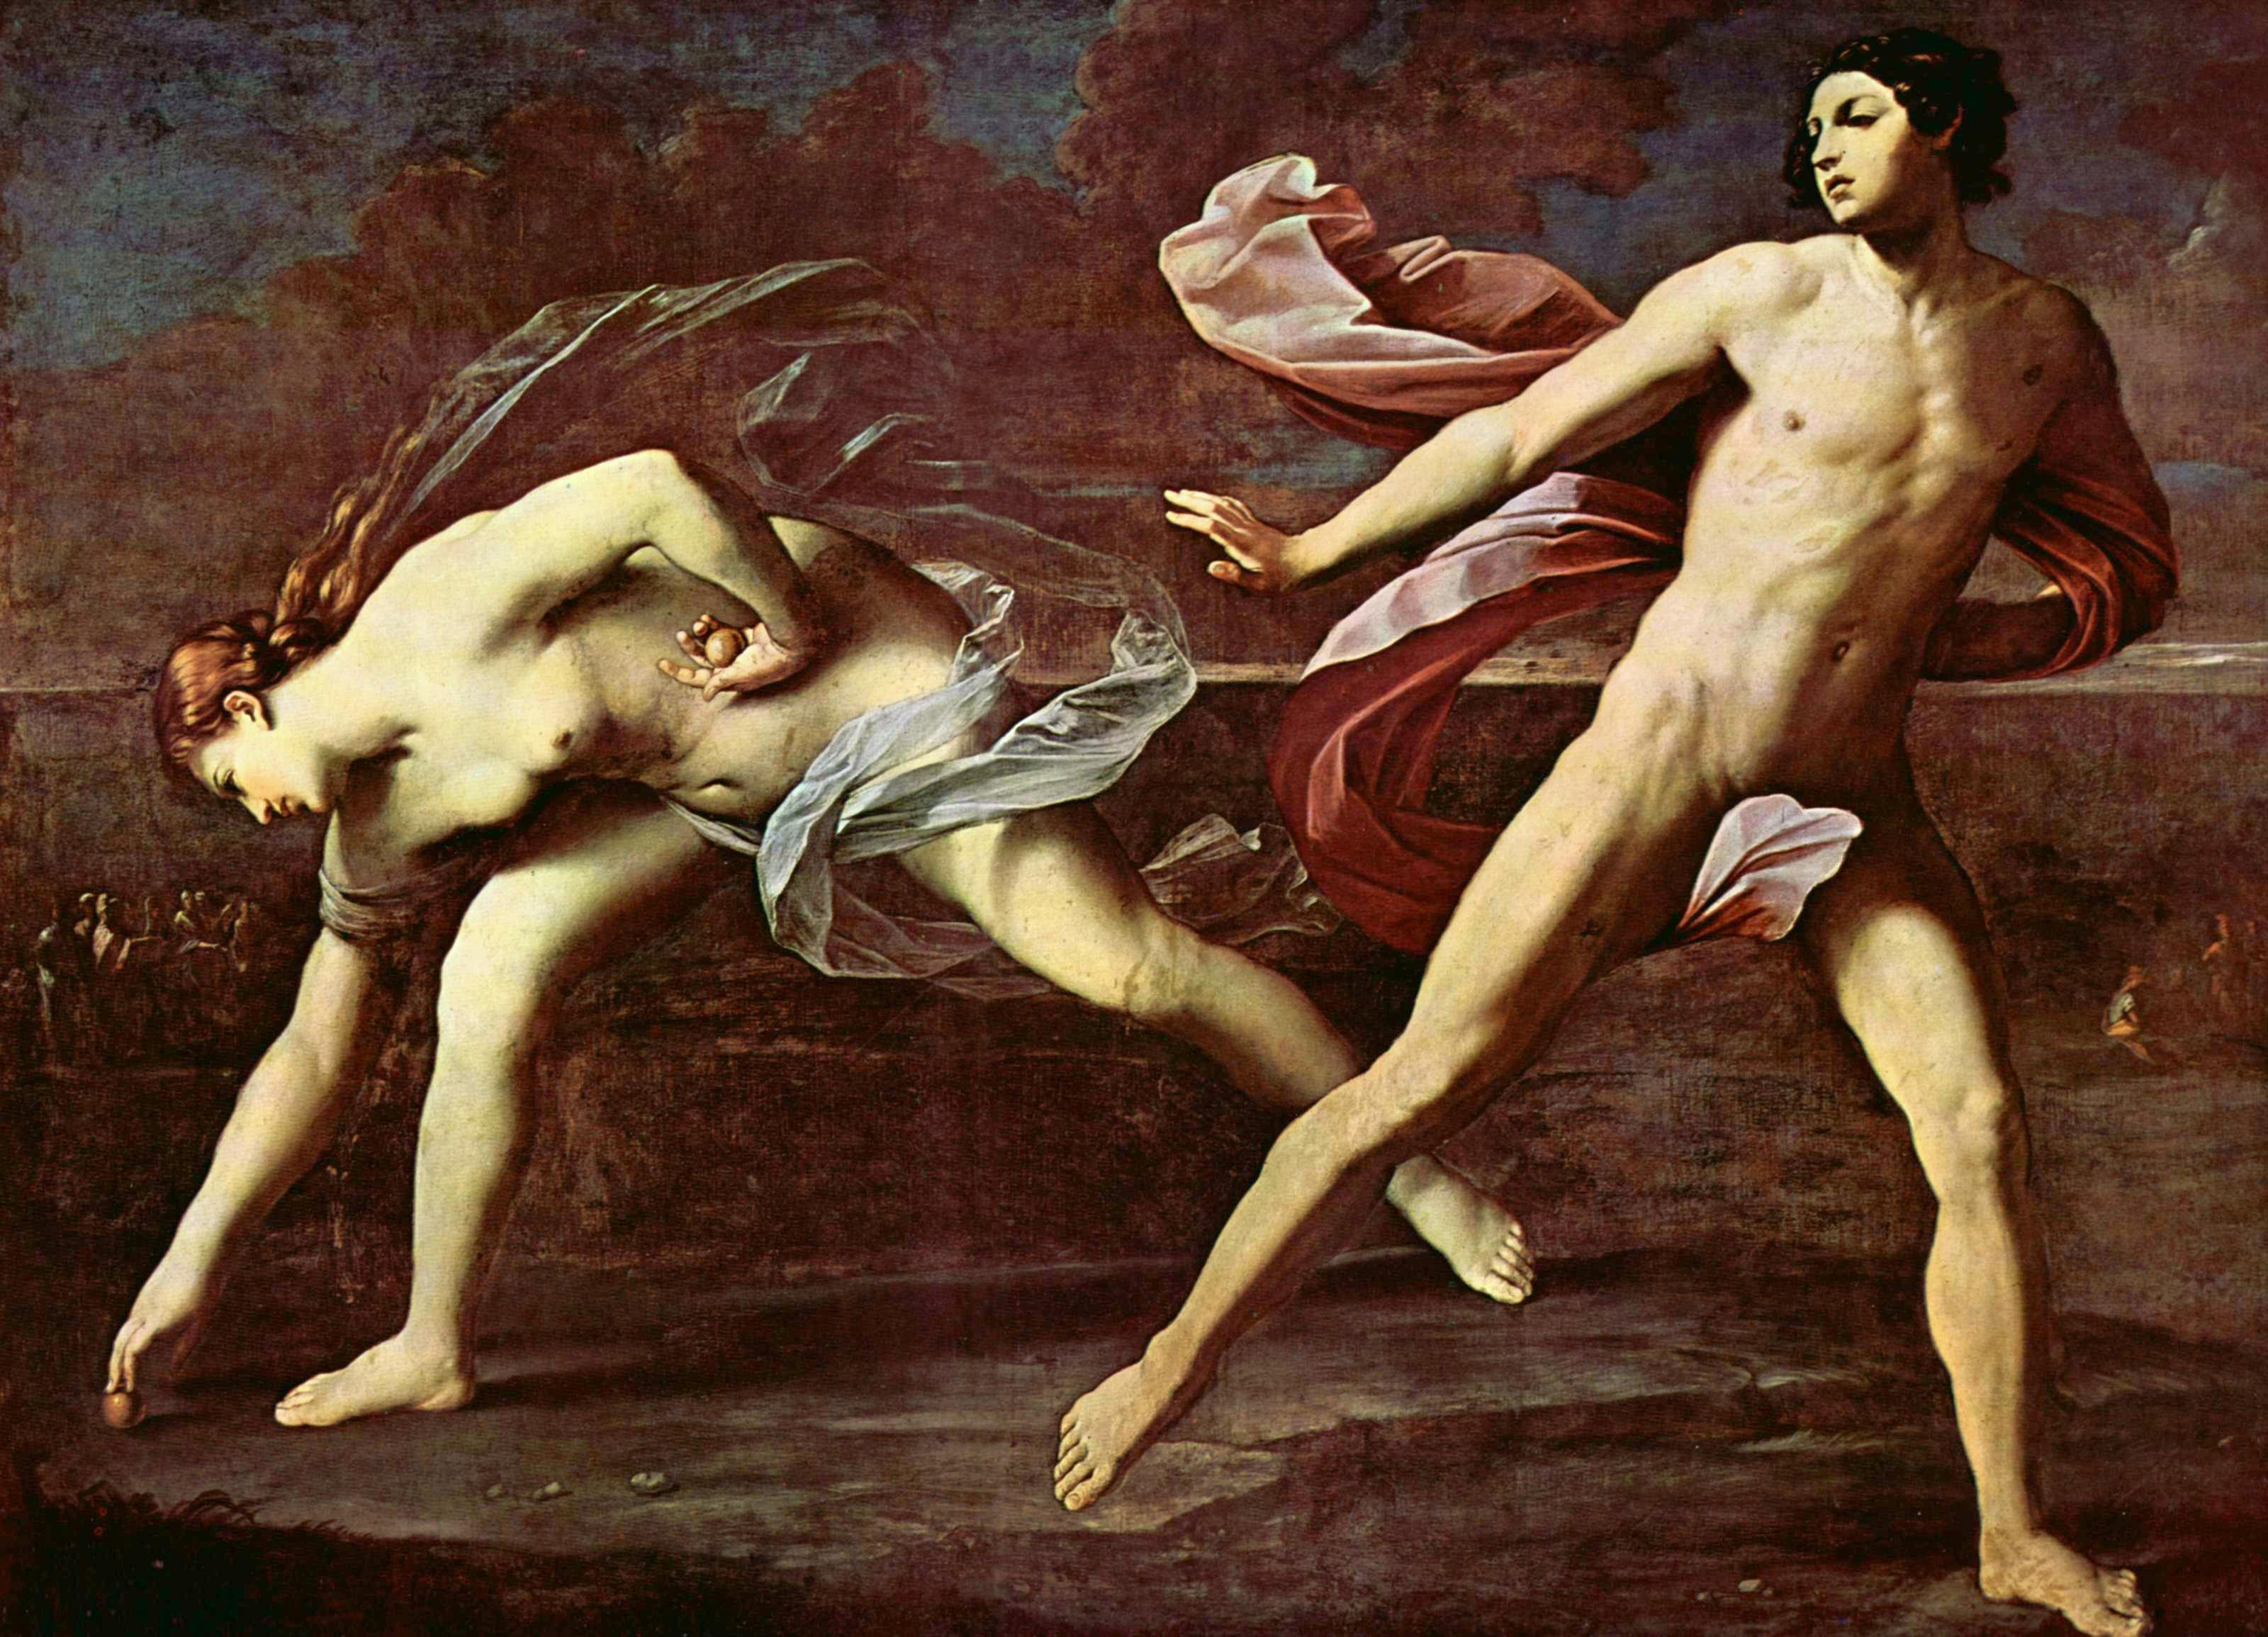 Atalanta e Ippomene (Guido Reni)